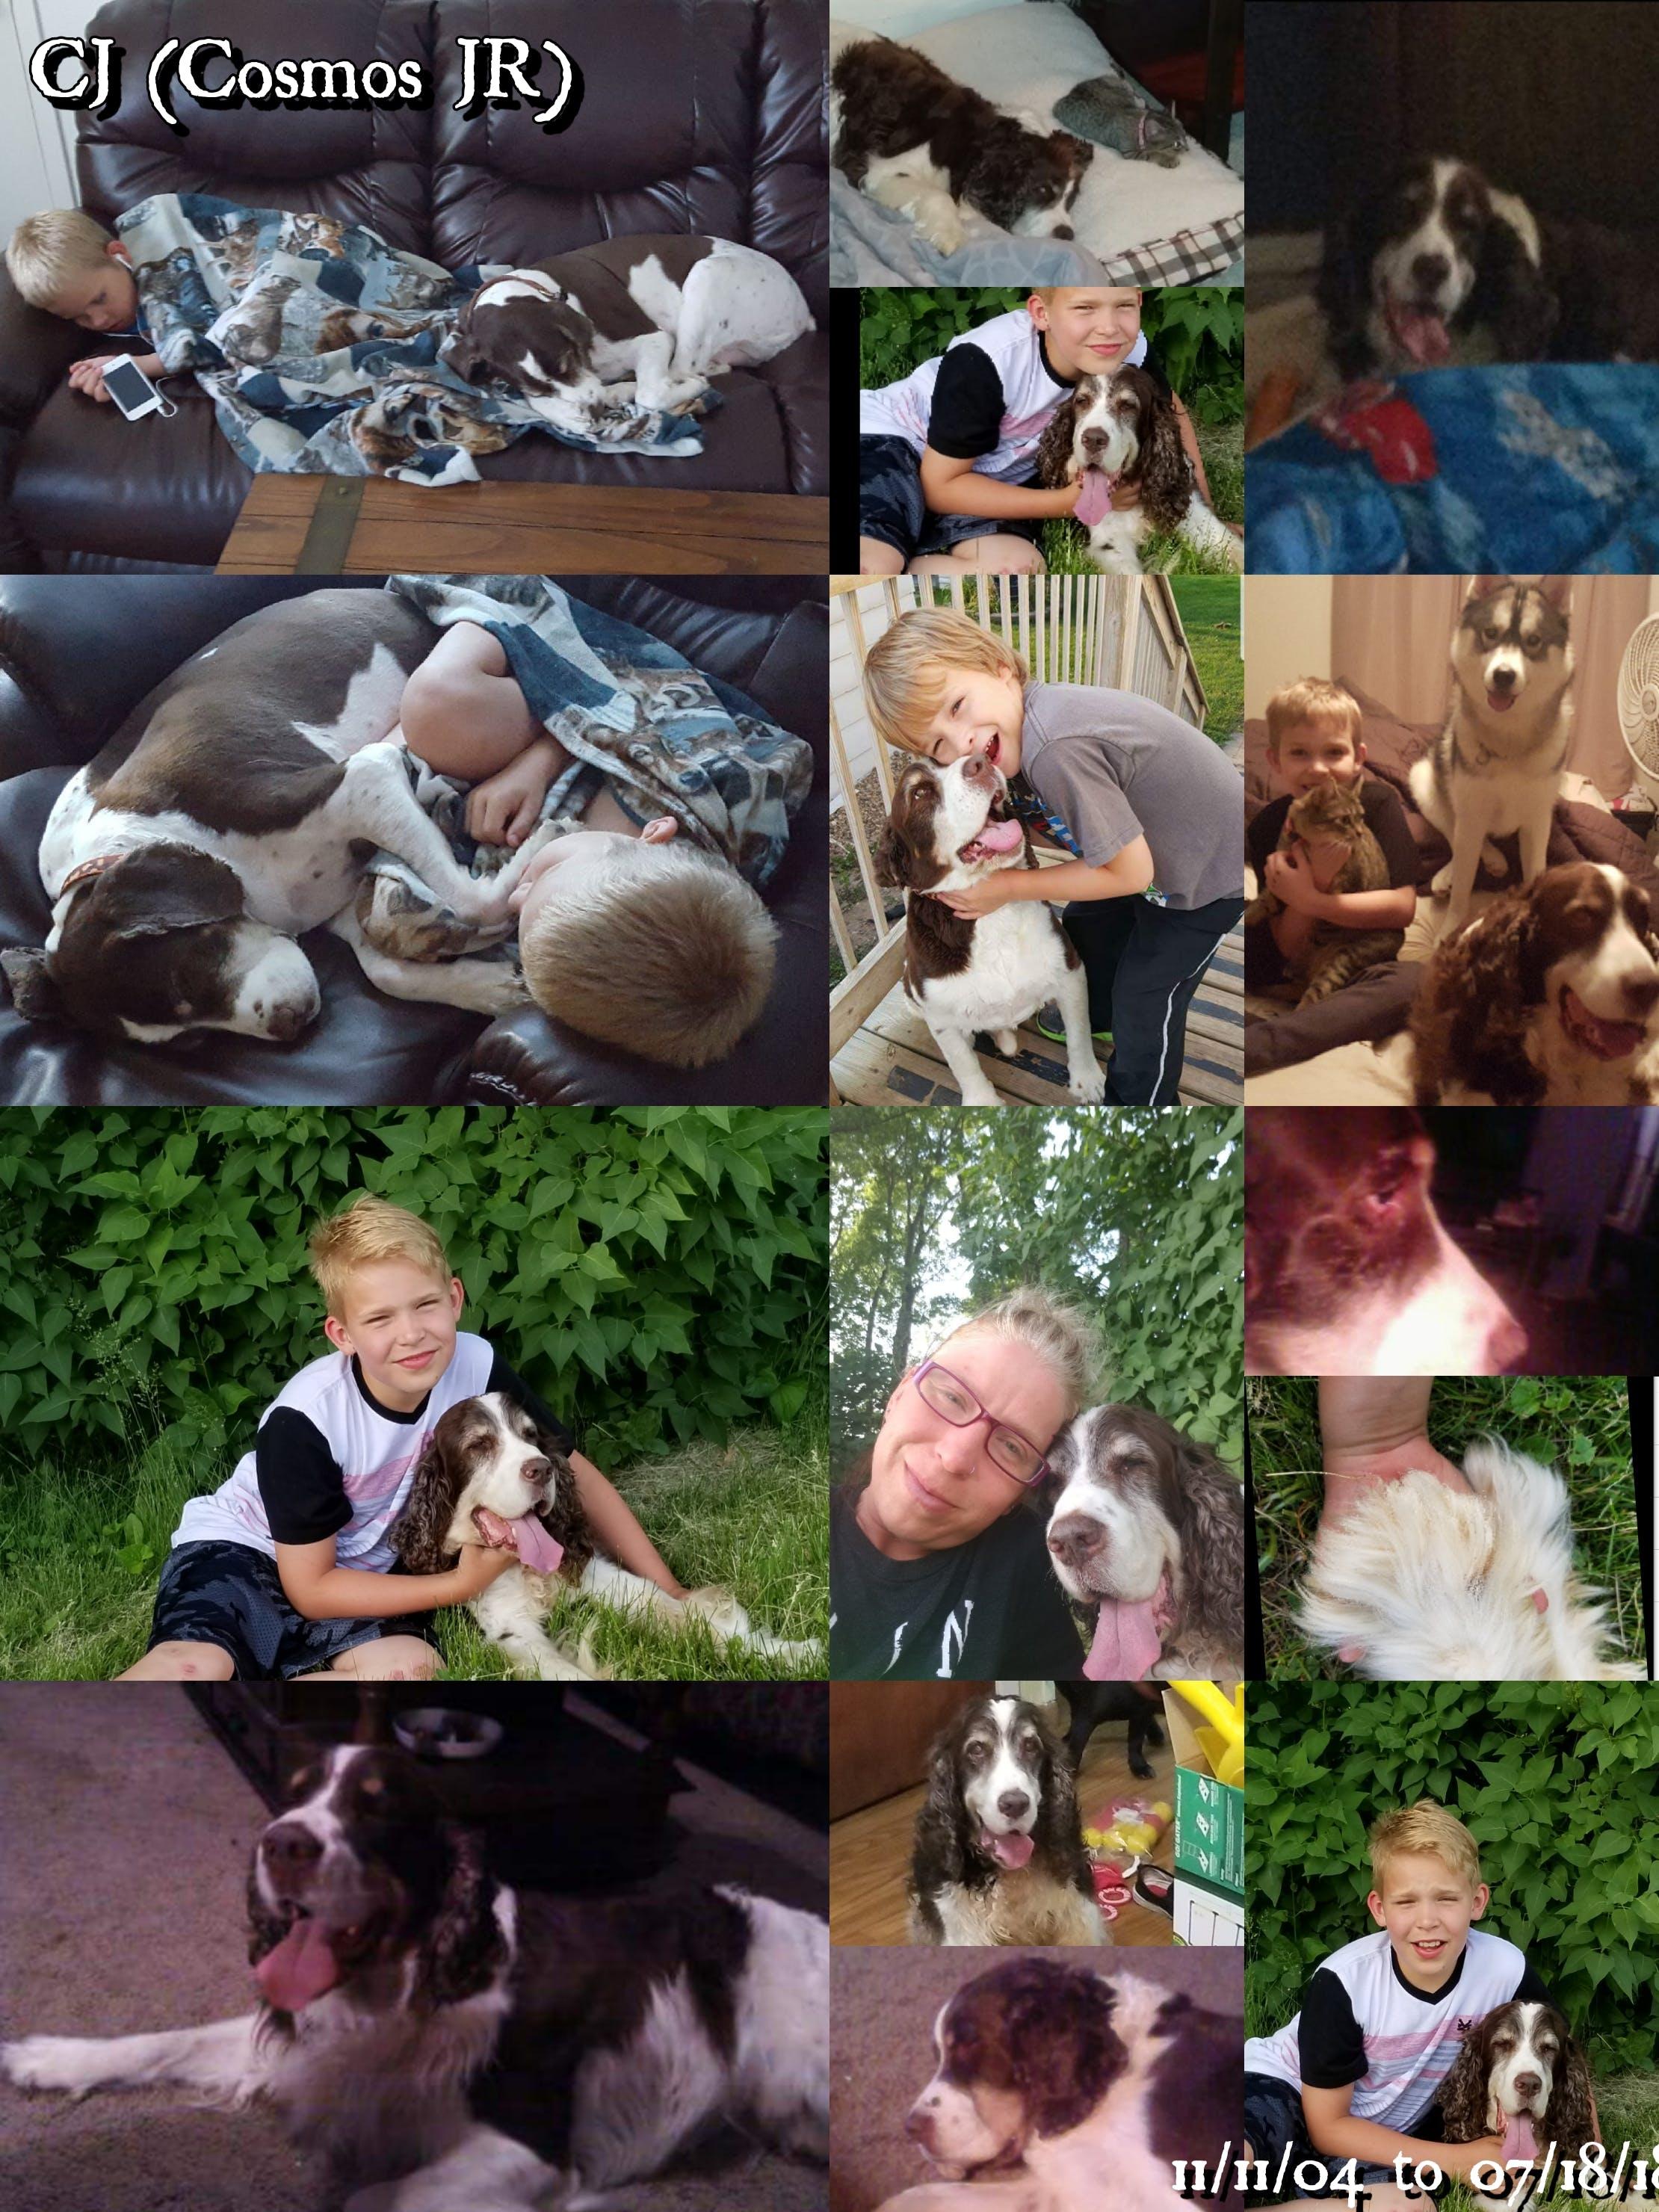 Cosmos jr's name story for English Springer Spaniel Dog Names